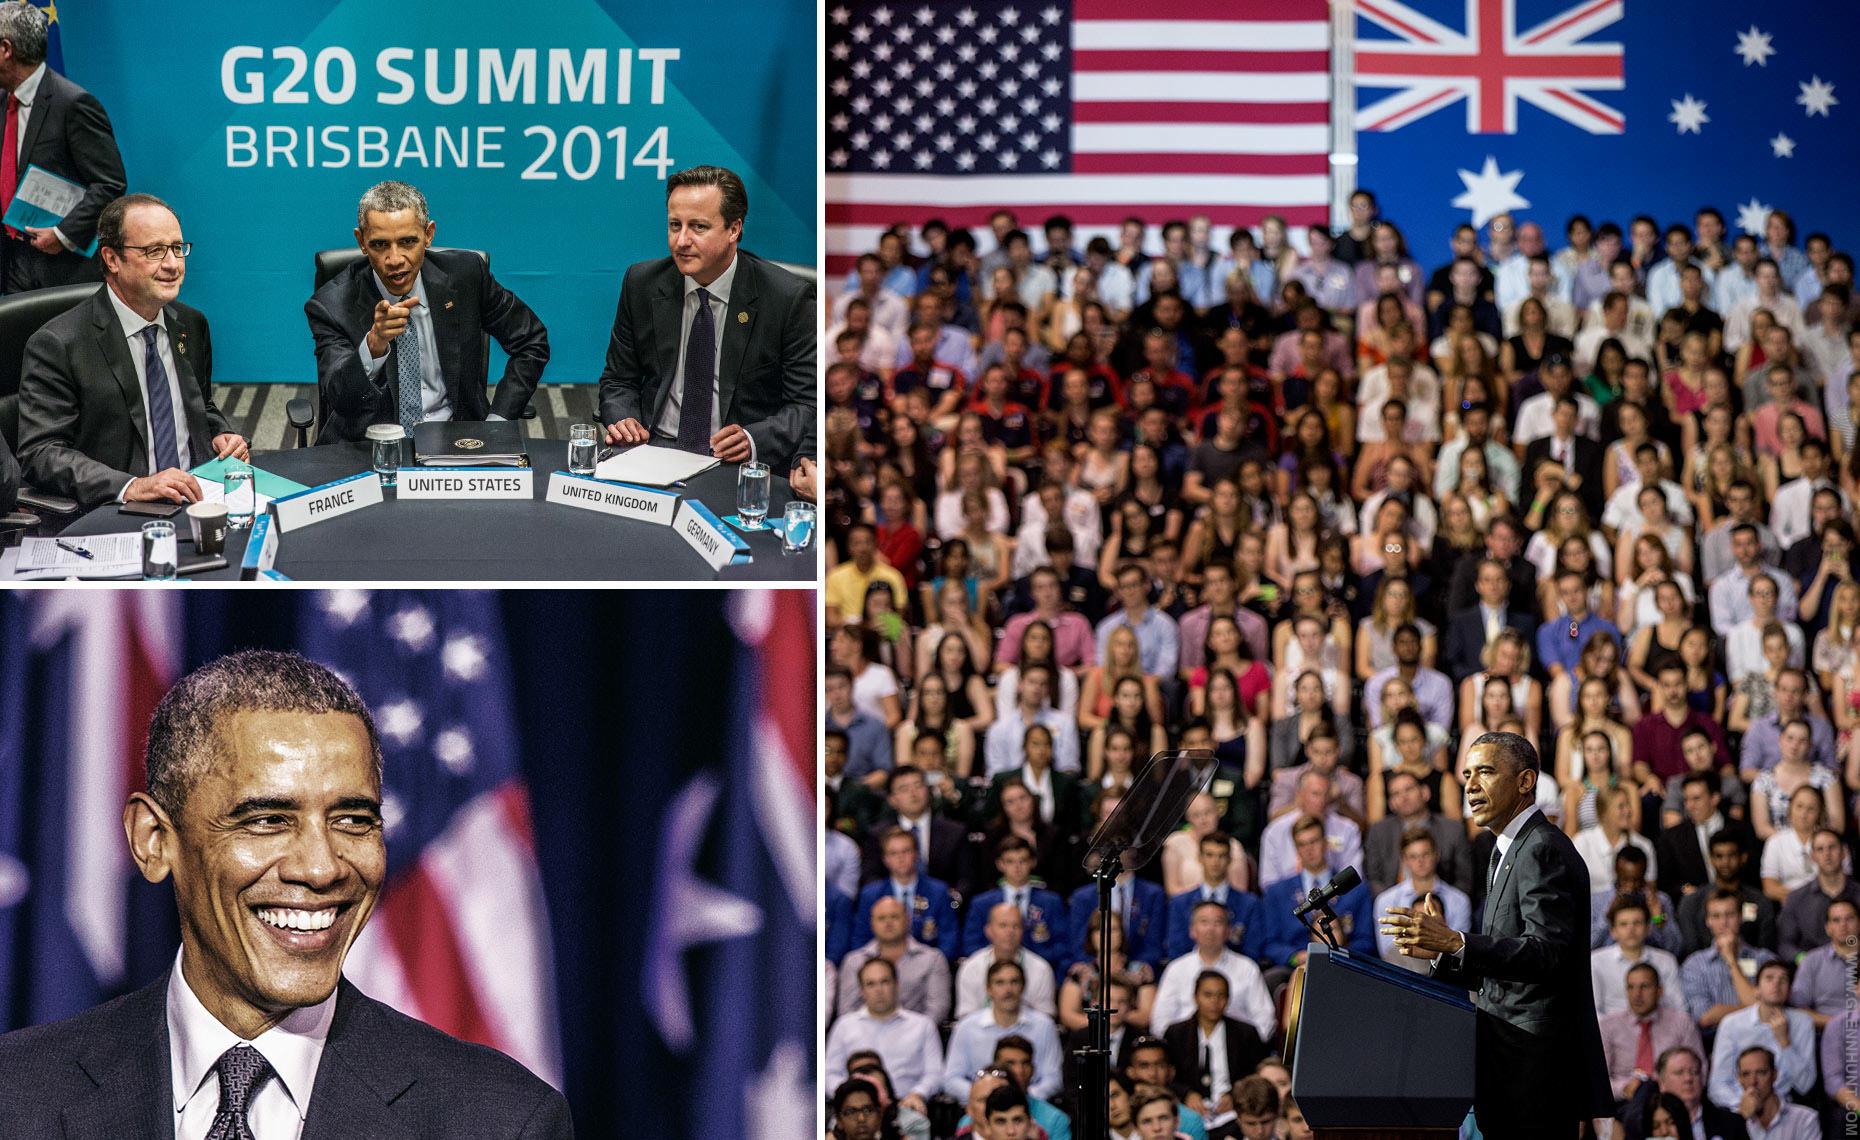 Barack Obama at the Brisbane G20 Summit